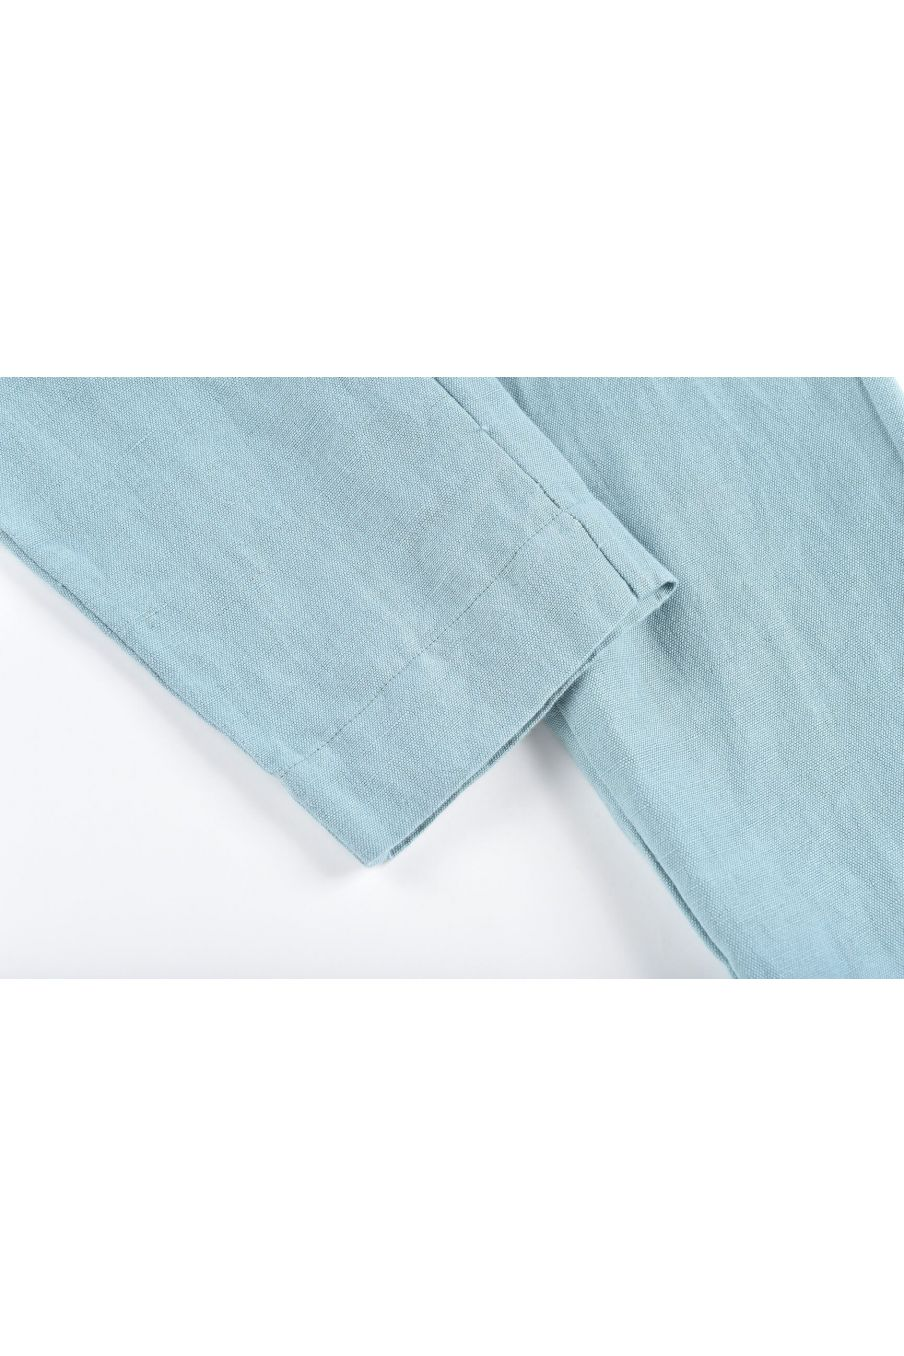 boheme chic vintage salopette fille amishi vintage blue